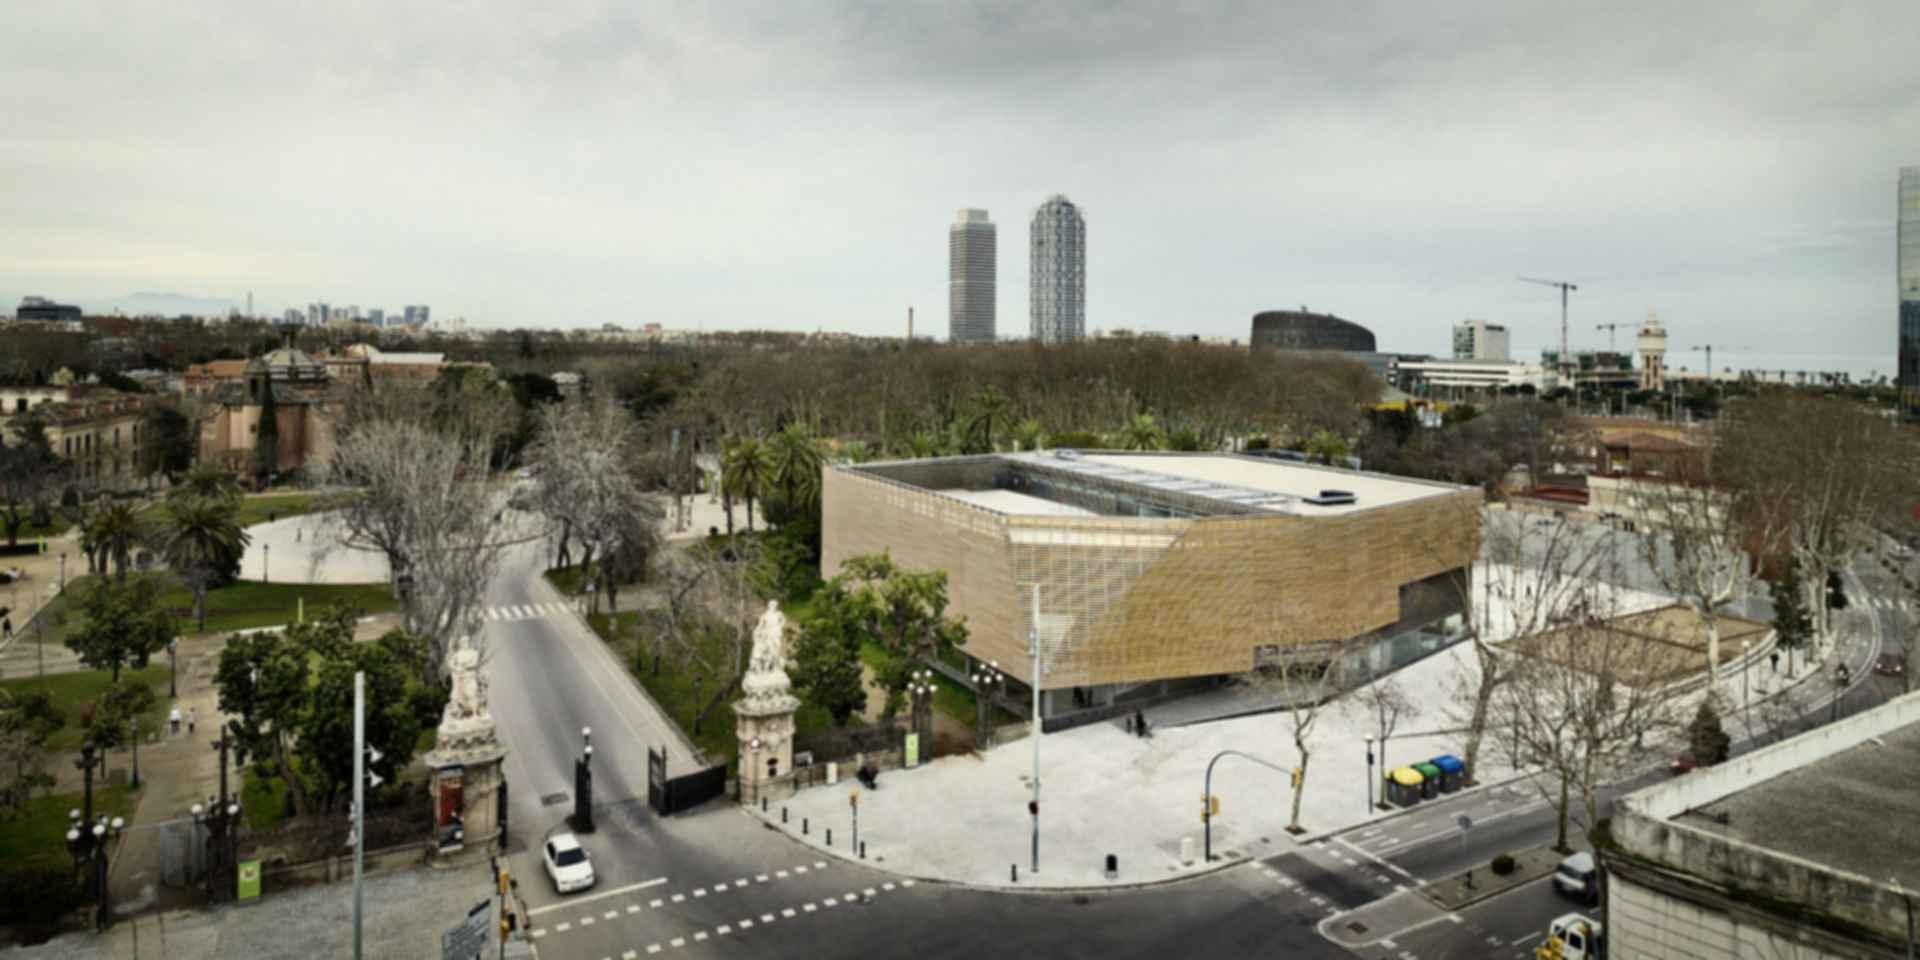 Ciutadella Park Sports Center - Exterior/Landscape